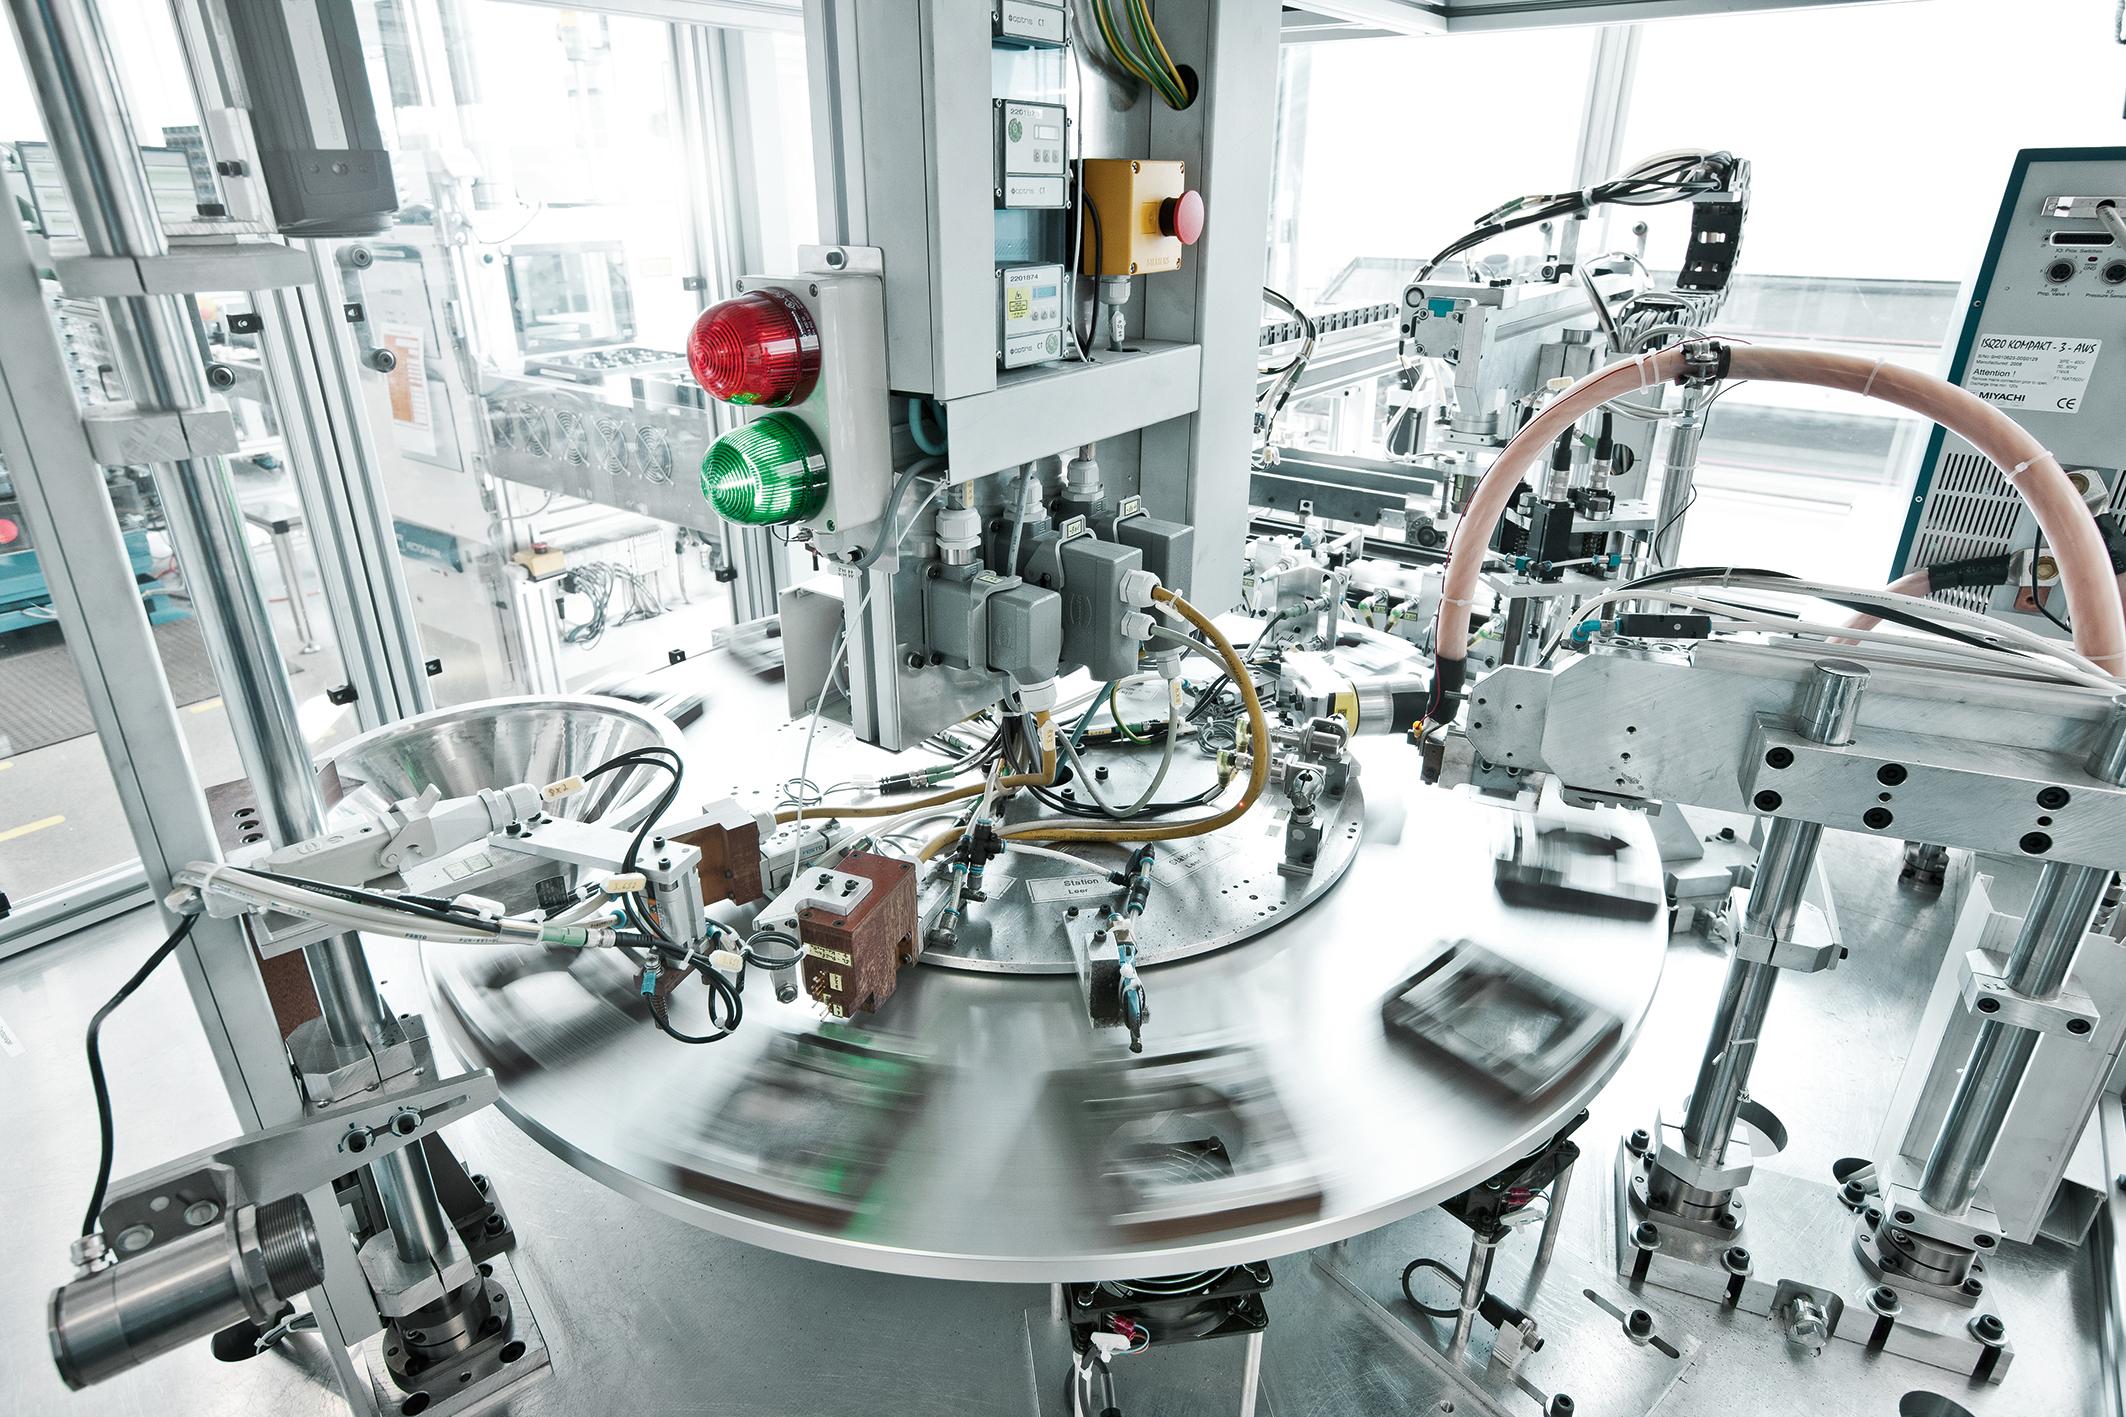 Optimierung der innovativen Dickschicht-Fertigung E.G.O. investiert in den kommenden fünf Jahren 36 Mio. Euro in den Standort Oberderdingen - unter anderem in die Optimierung der innovativen Dickschicht-Fertigung. (Foto: E.G.O.)